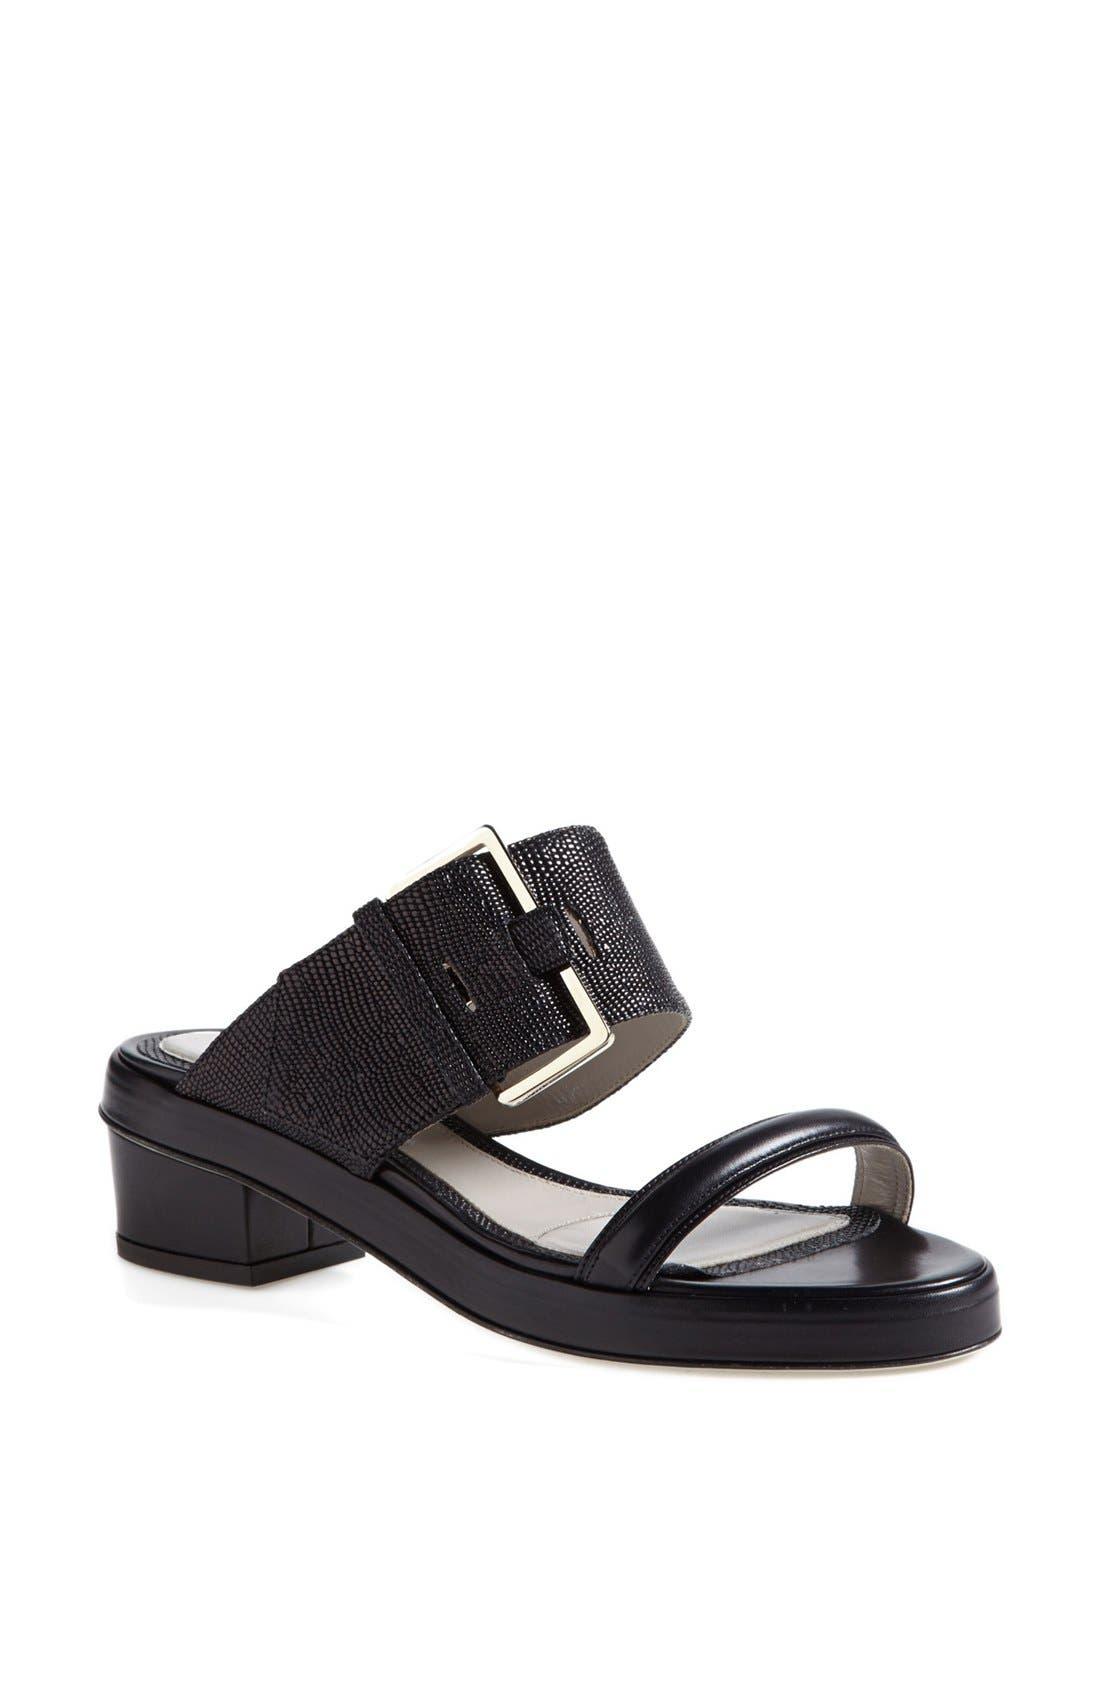 Alternate Image 1 Selected - Jason Wu Double Strap Sandal